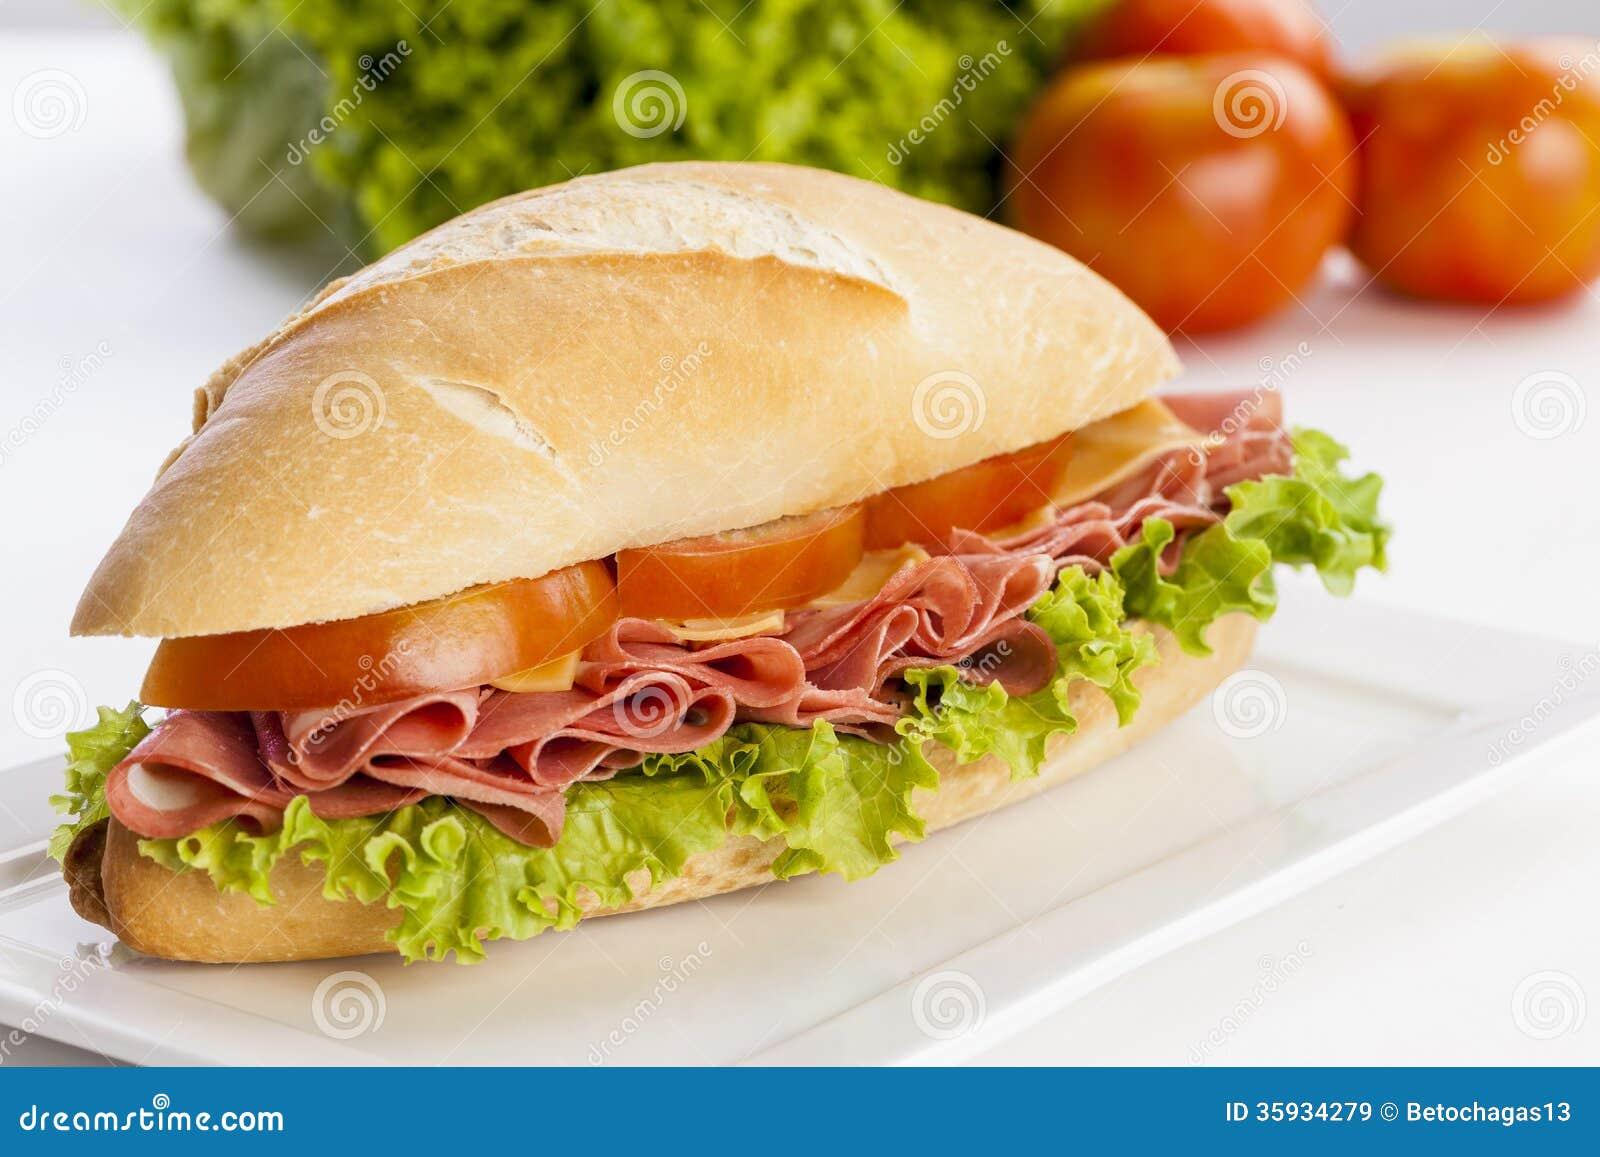 Mortadela sandwich stock image. Image of large, bologna ...